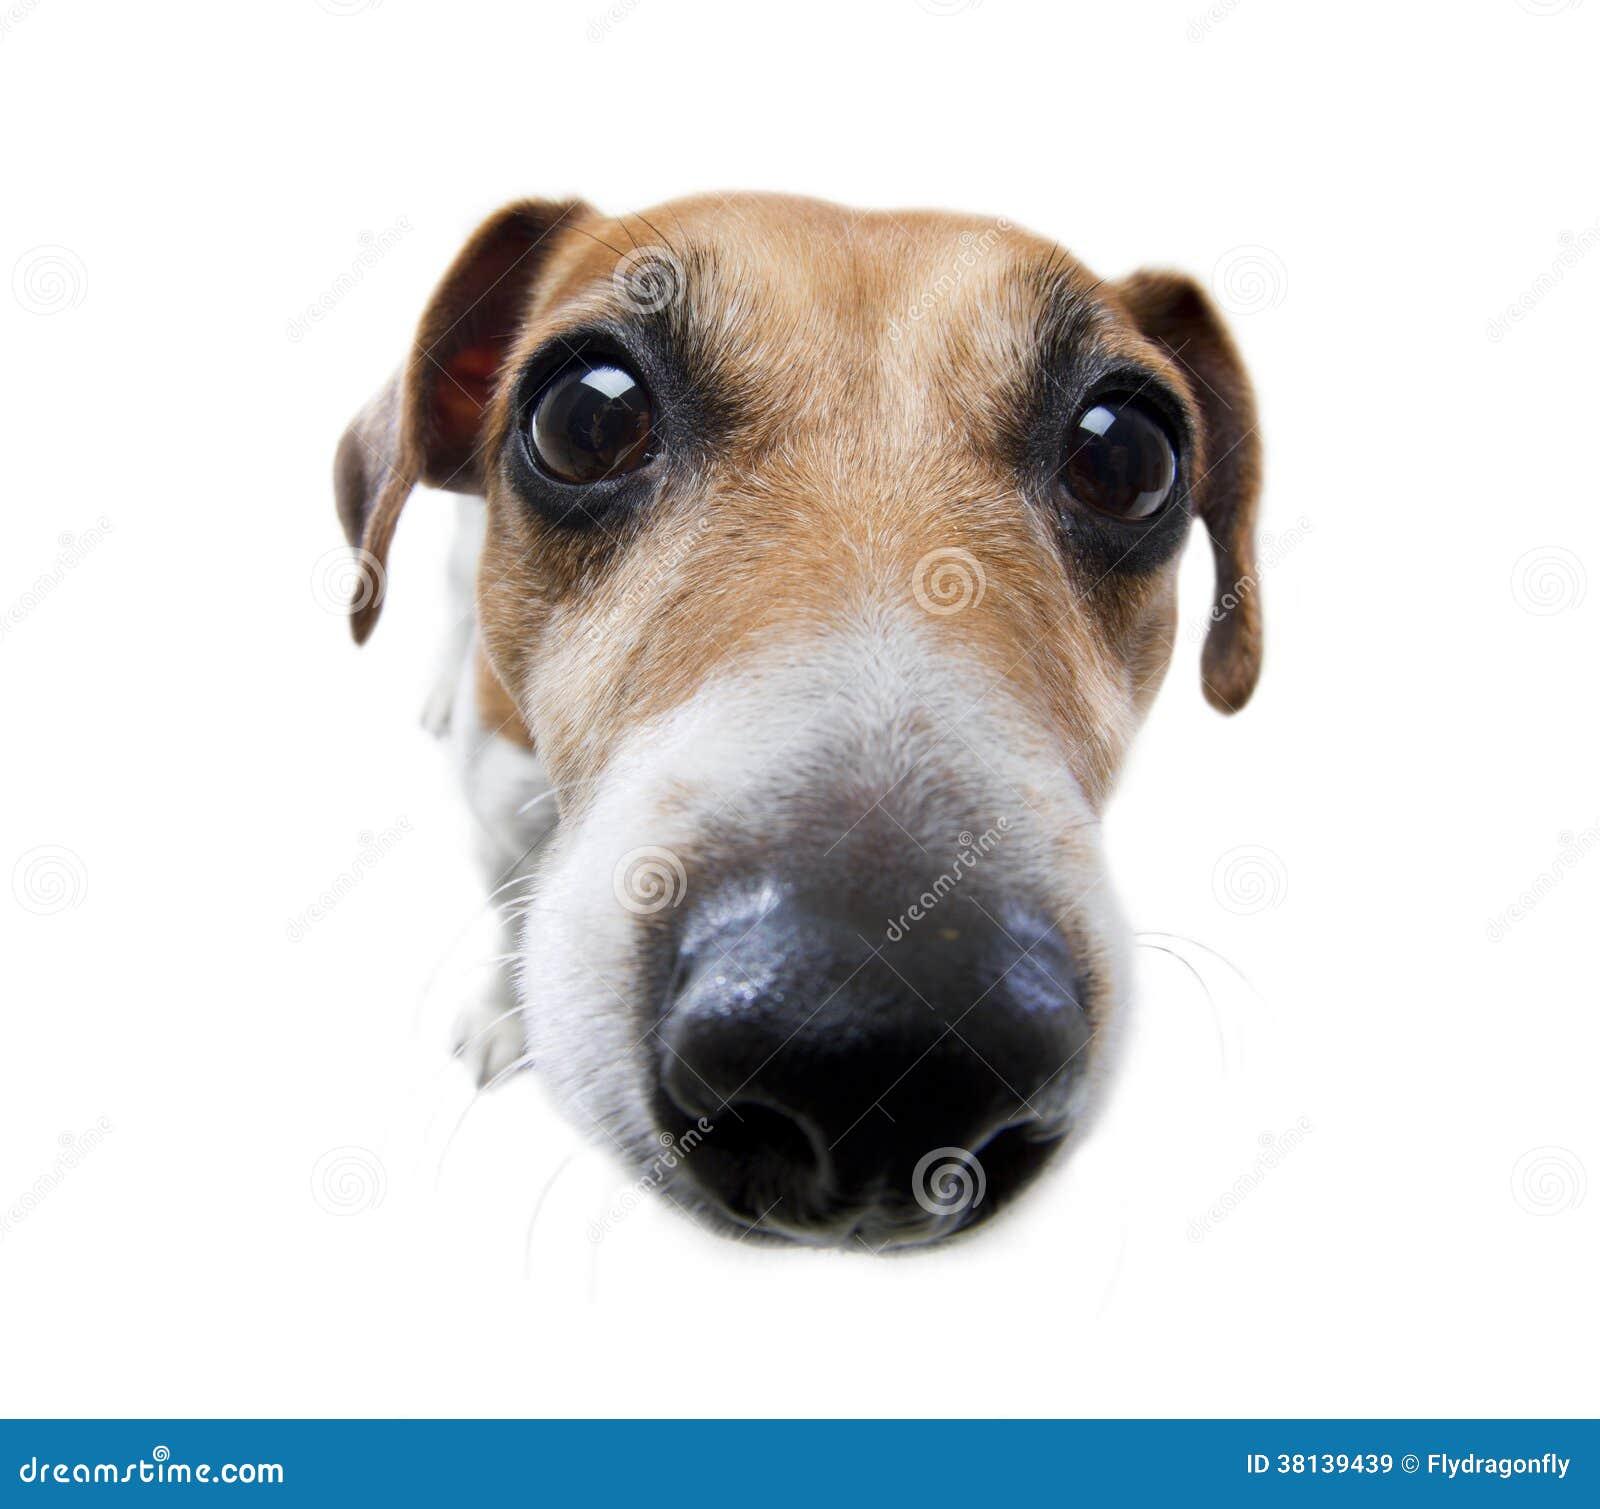 https://thumbs.dreamstime.com/z/funny-dog-nose-38139439.jpg